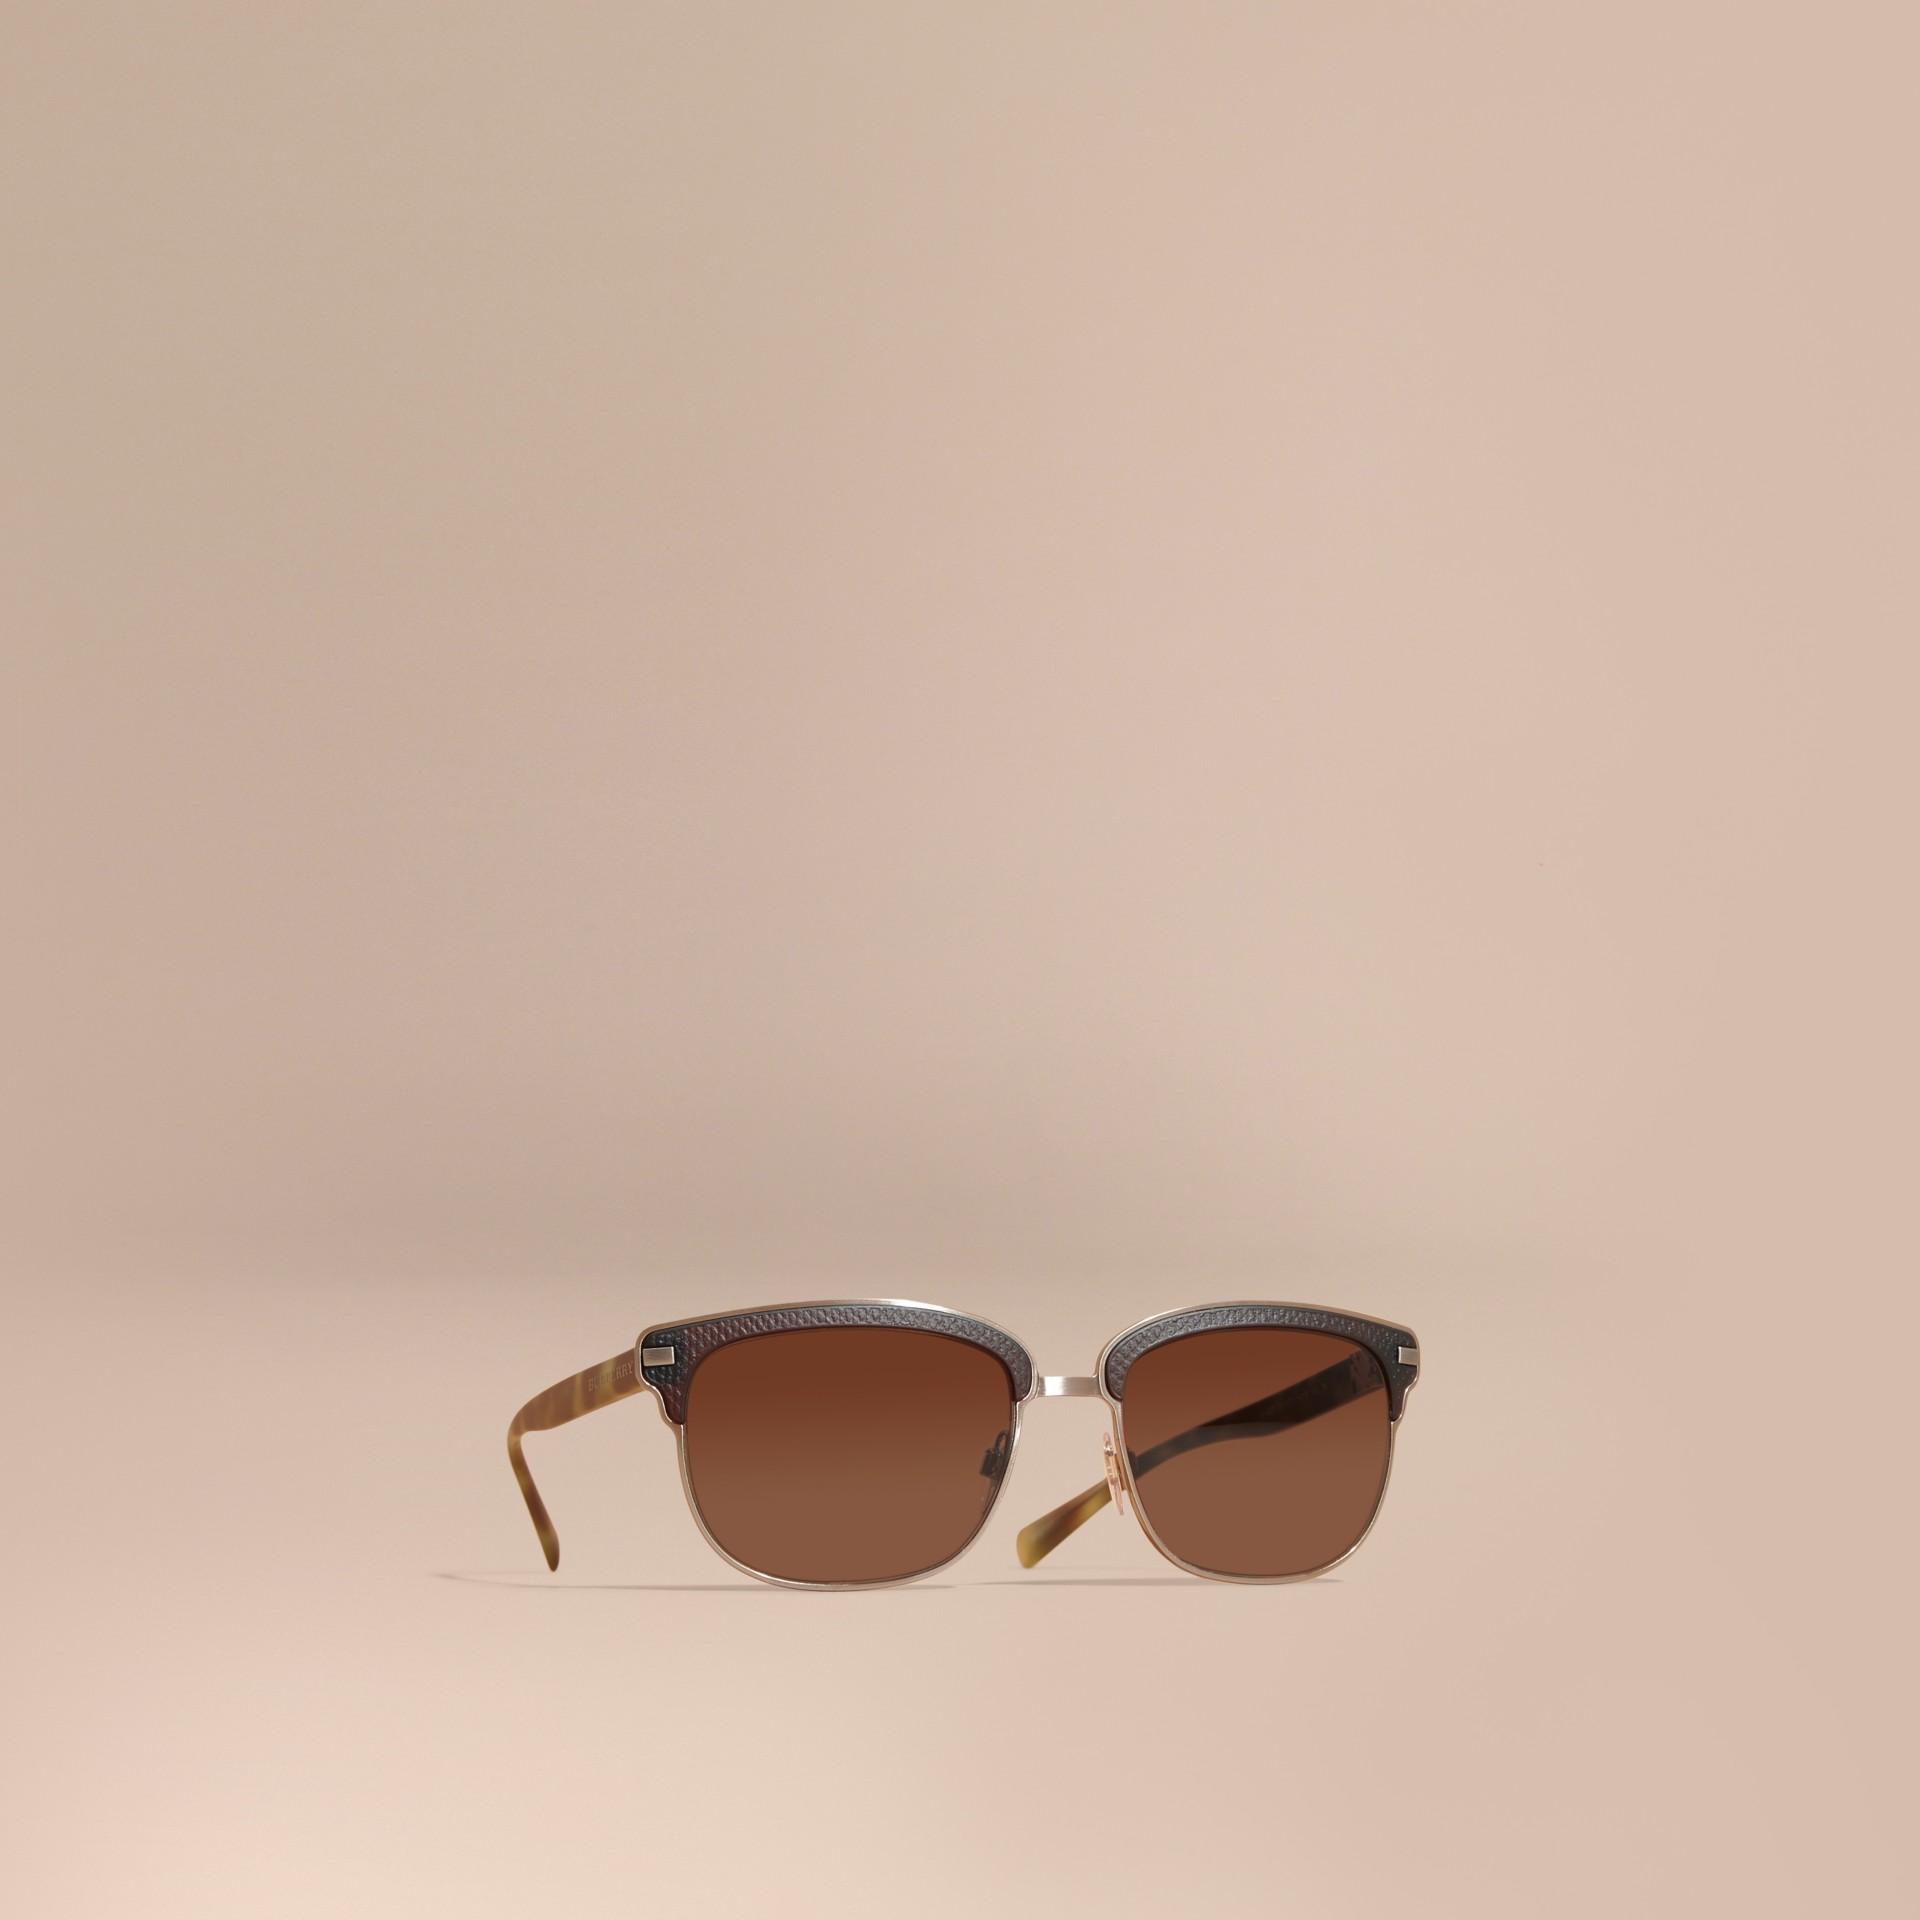 Burberry Glasses Frames Australia : Textured Front Square Frame Sunglasses in Brown - Men ...